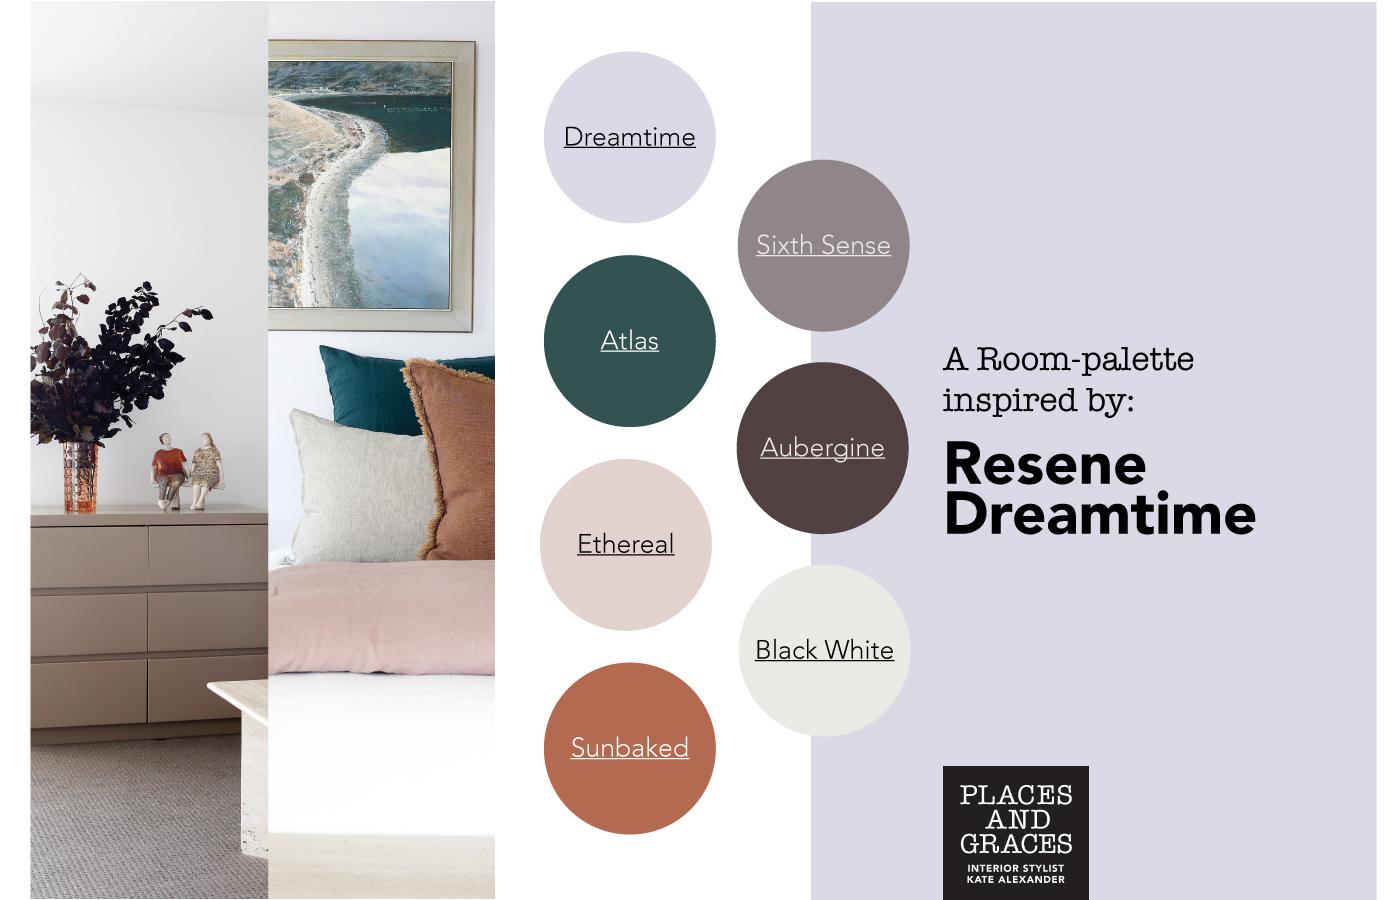 Places&Graces-Resene-Dreamtime-Moodboard-Teaser.jpg